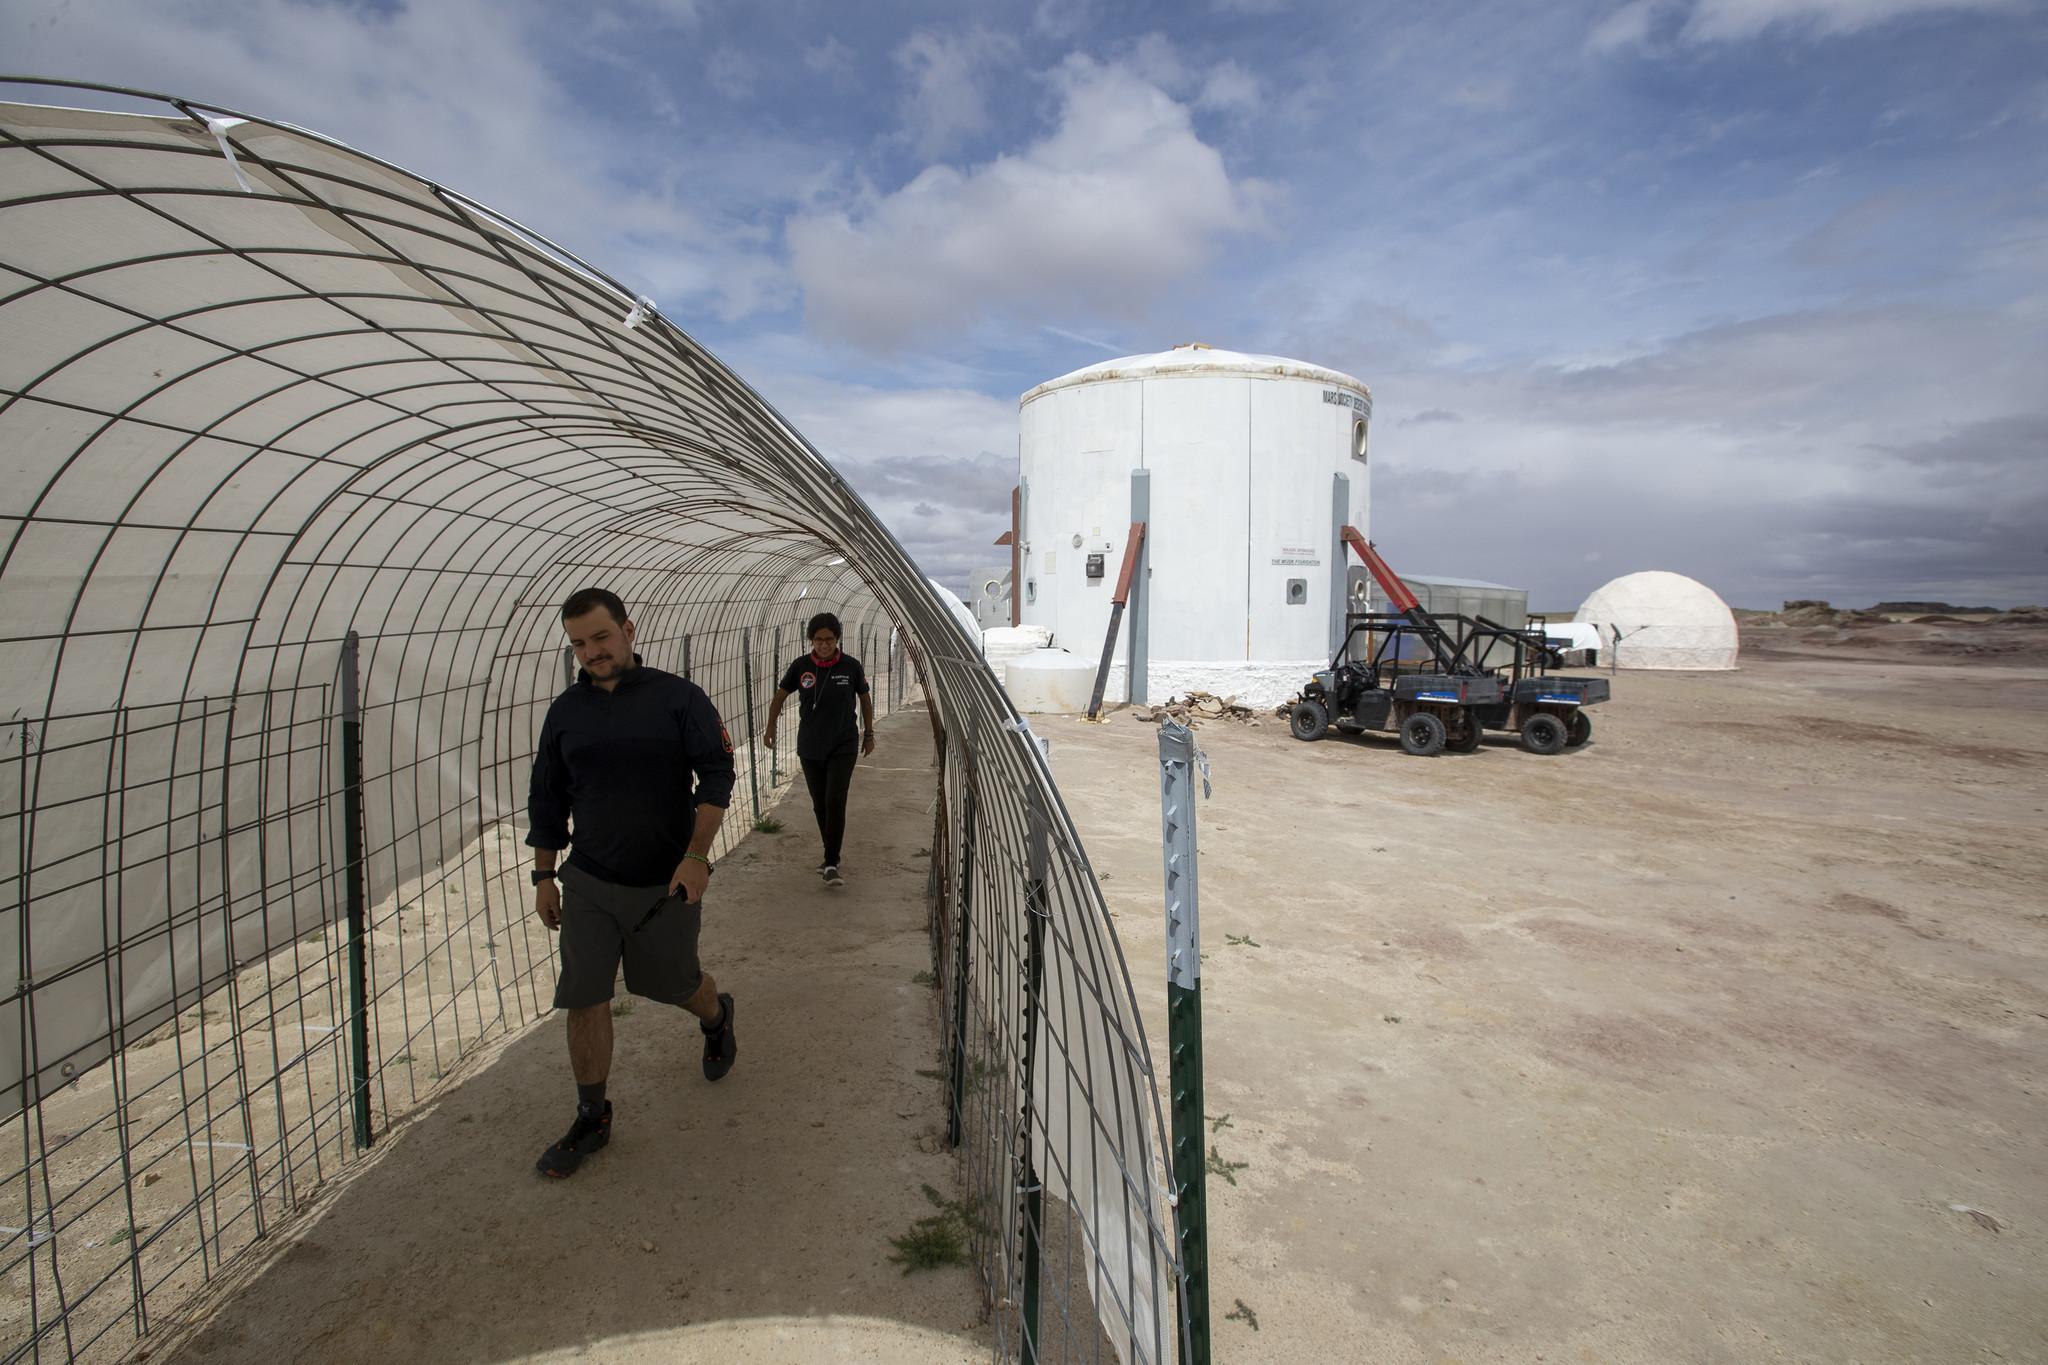 Life on Mars gets a test run in the Utah desert - Los